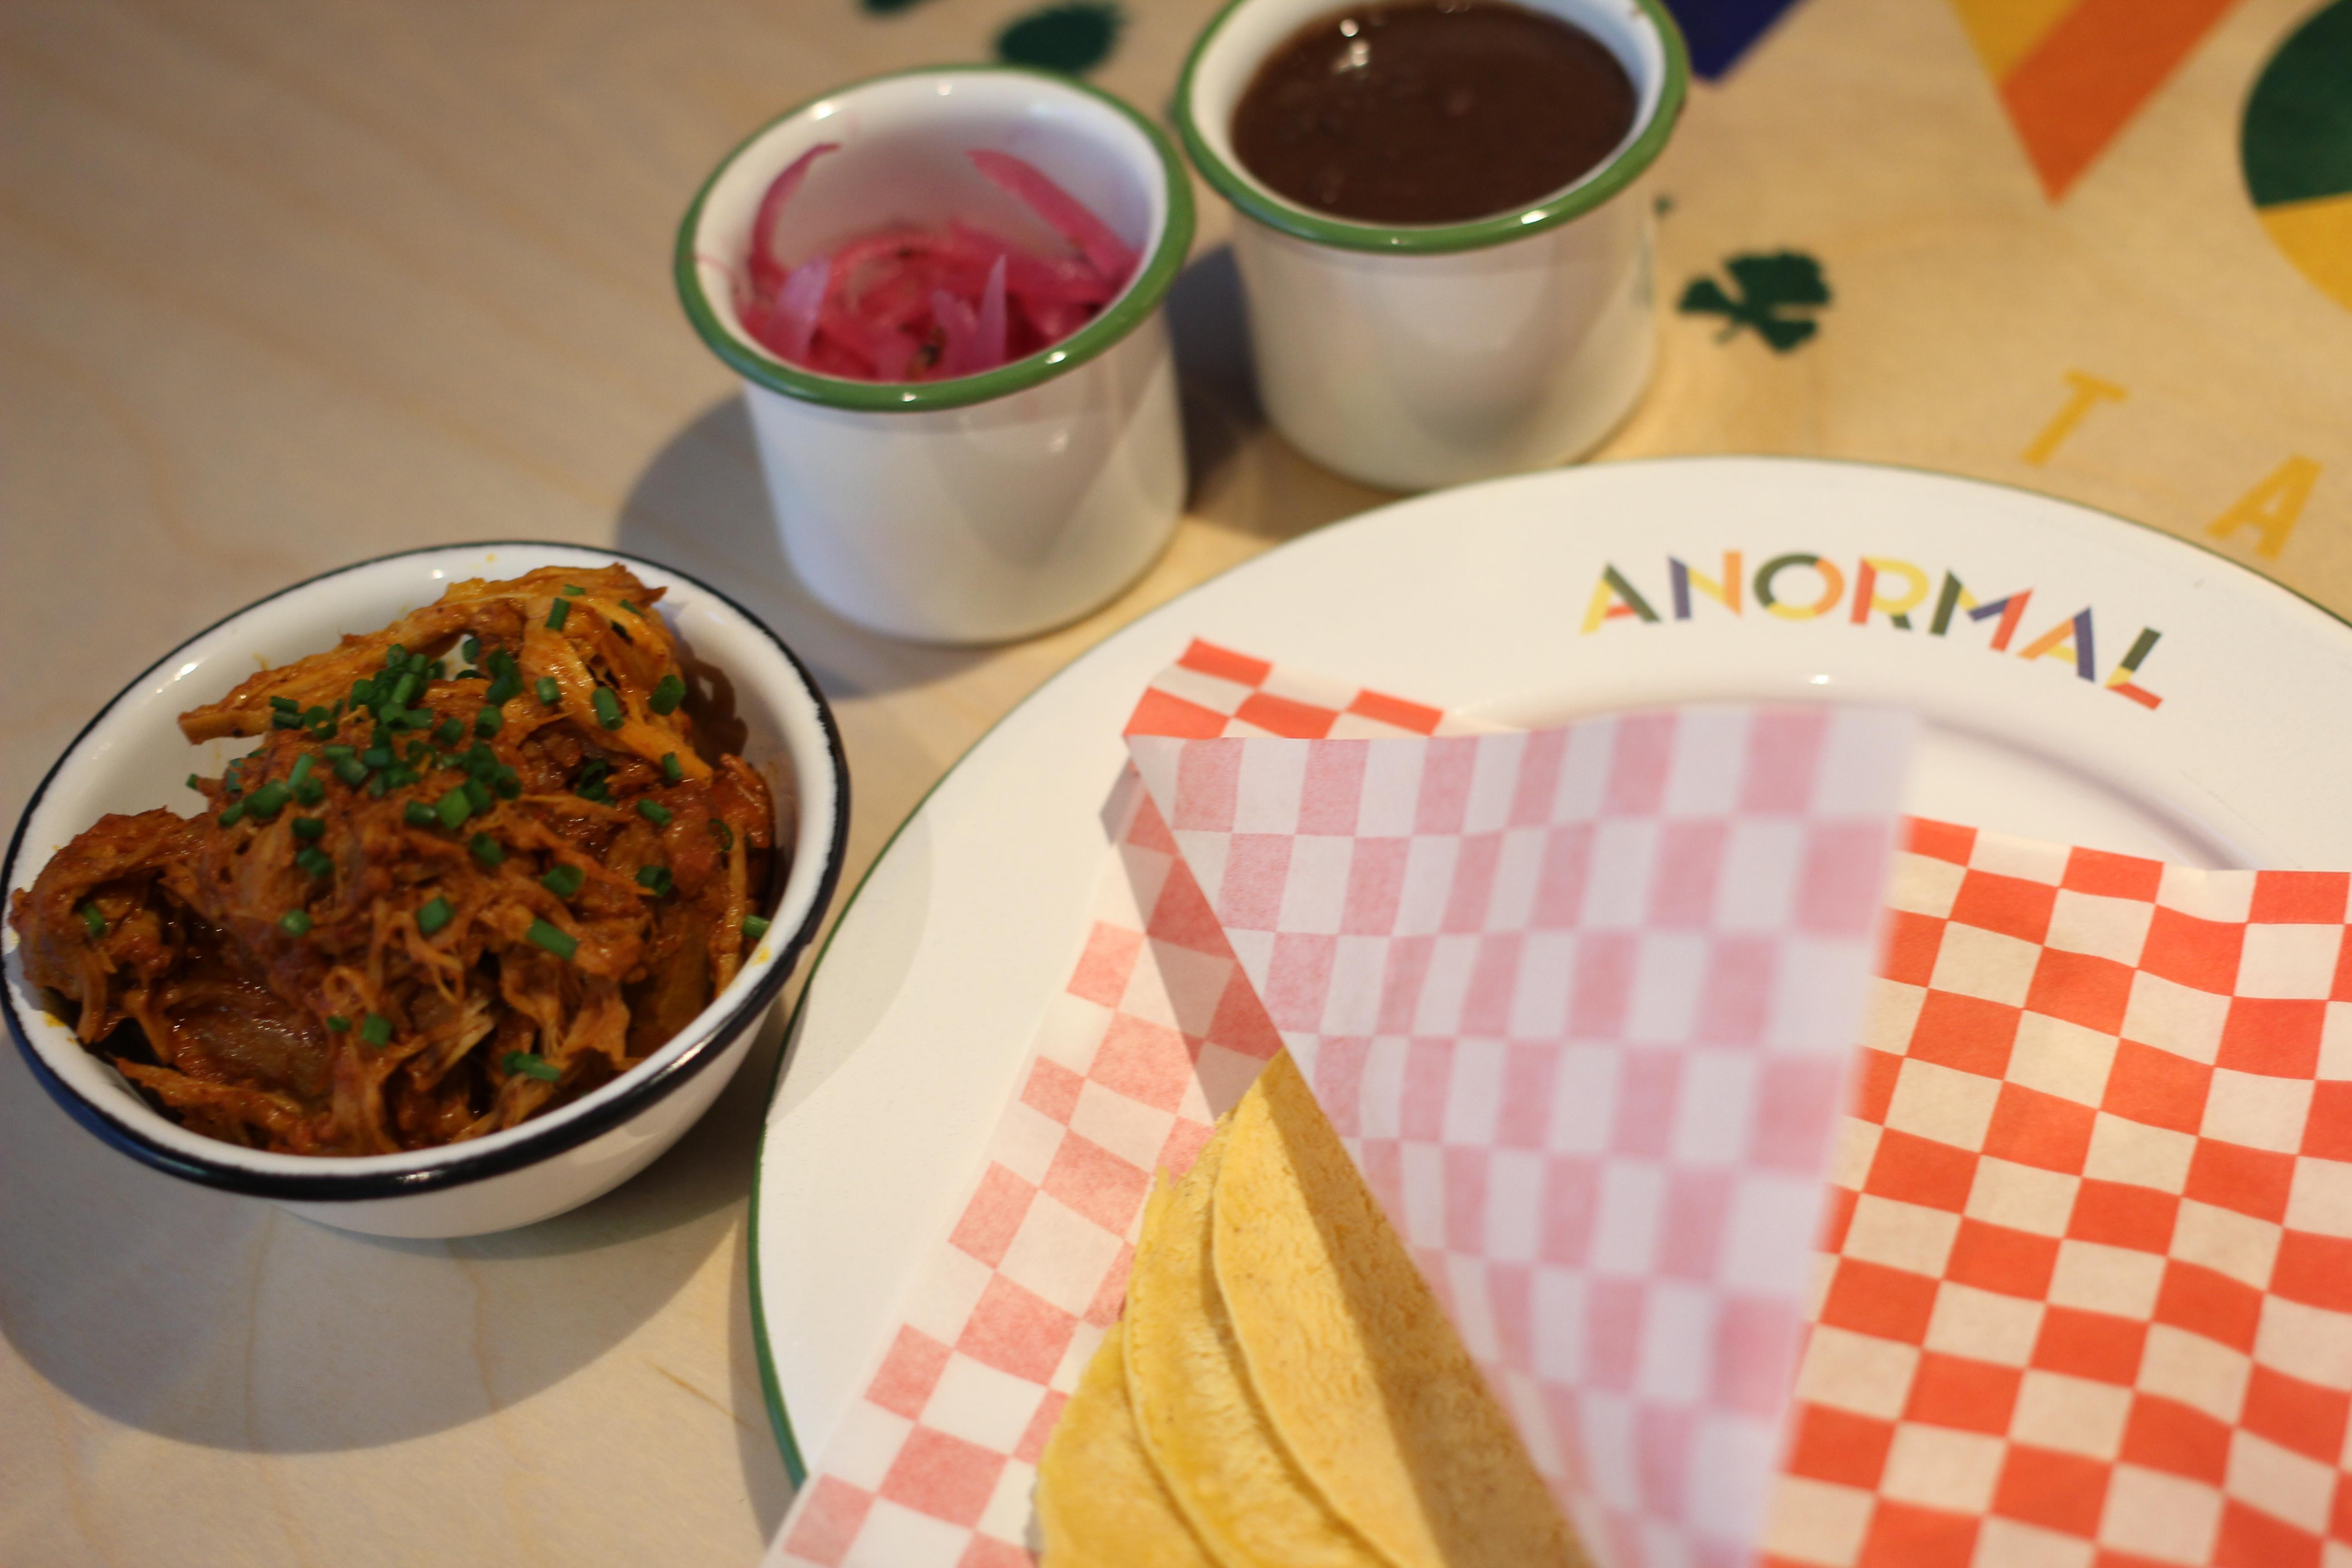 Restaurante Anormal by Spoonik